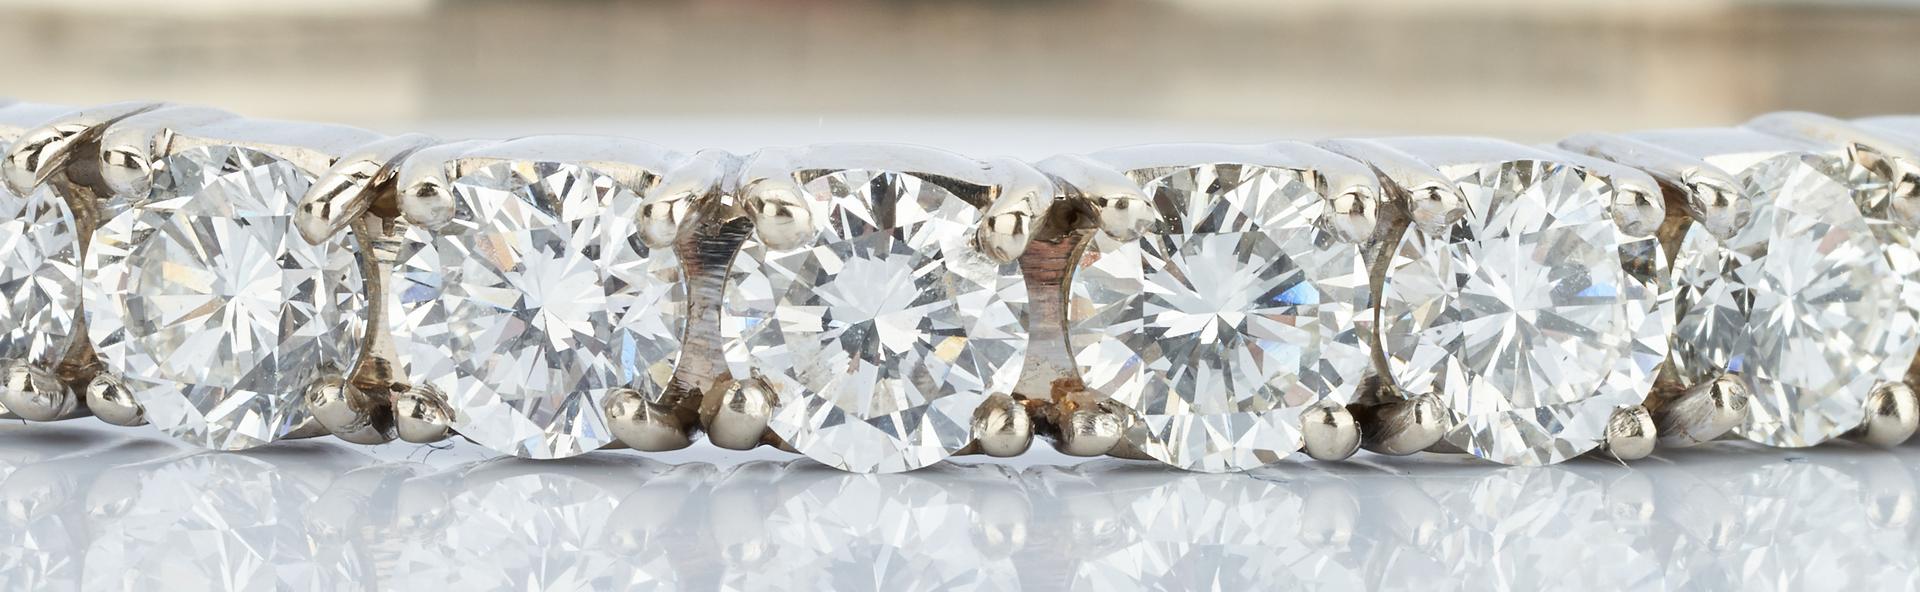 Lot 40: Diamond Bangle Bracelet, 6 ct t.w., 14k